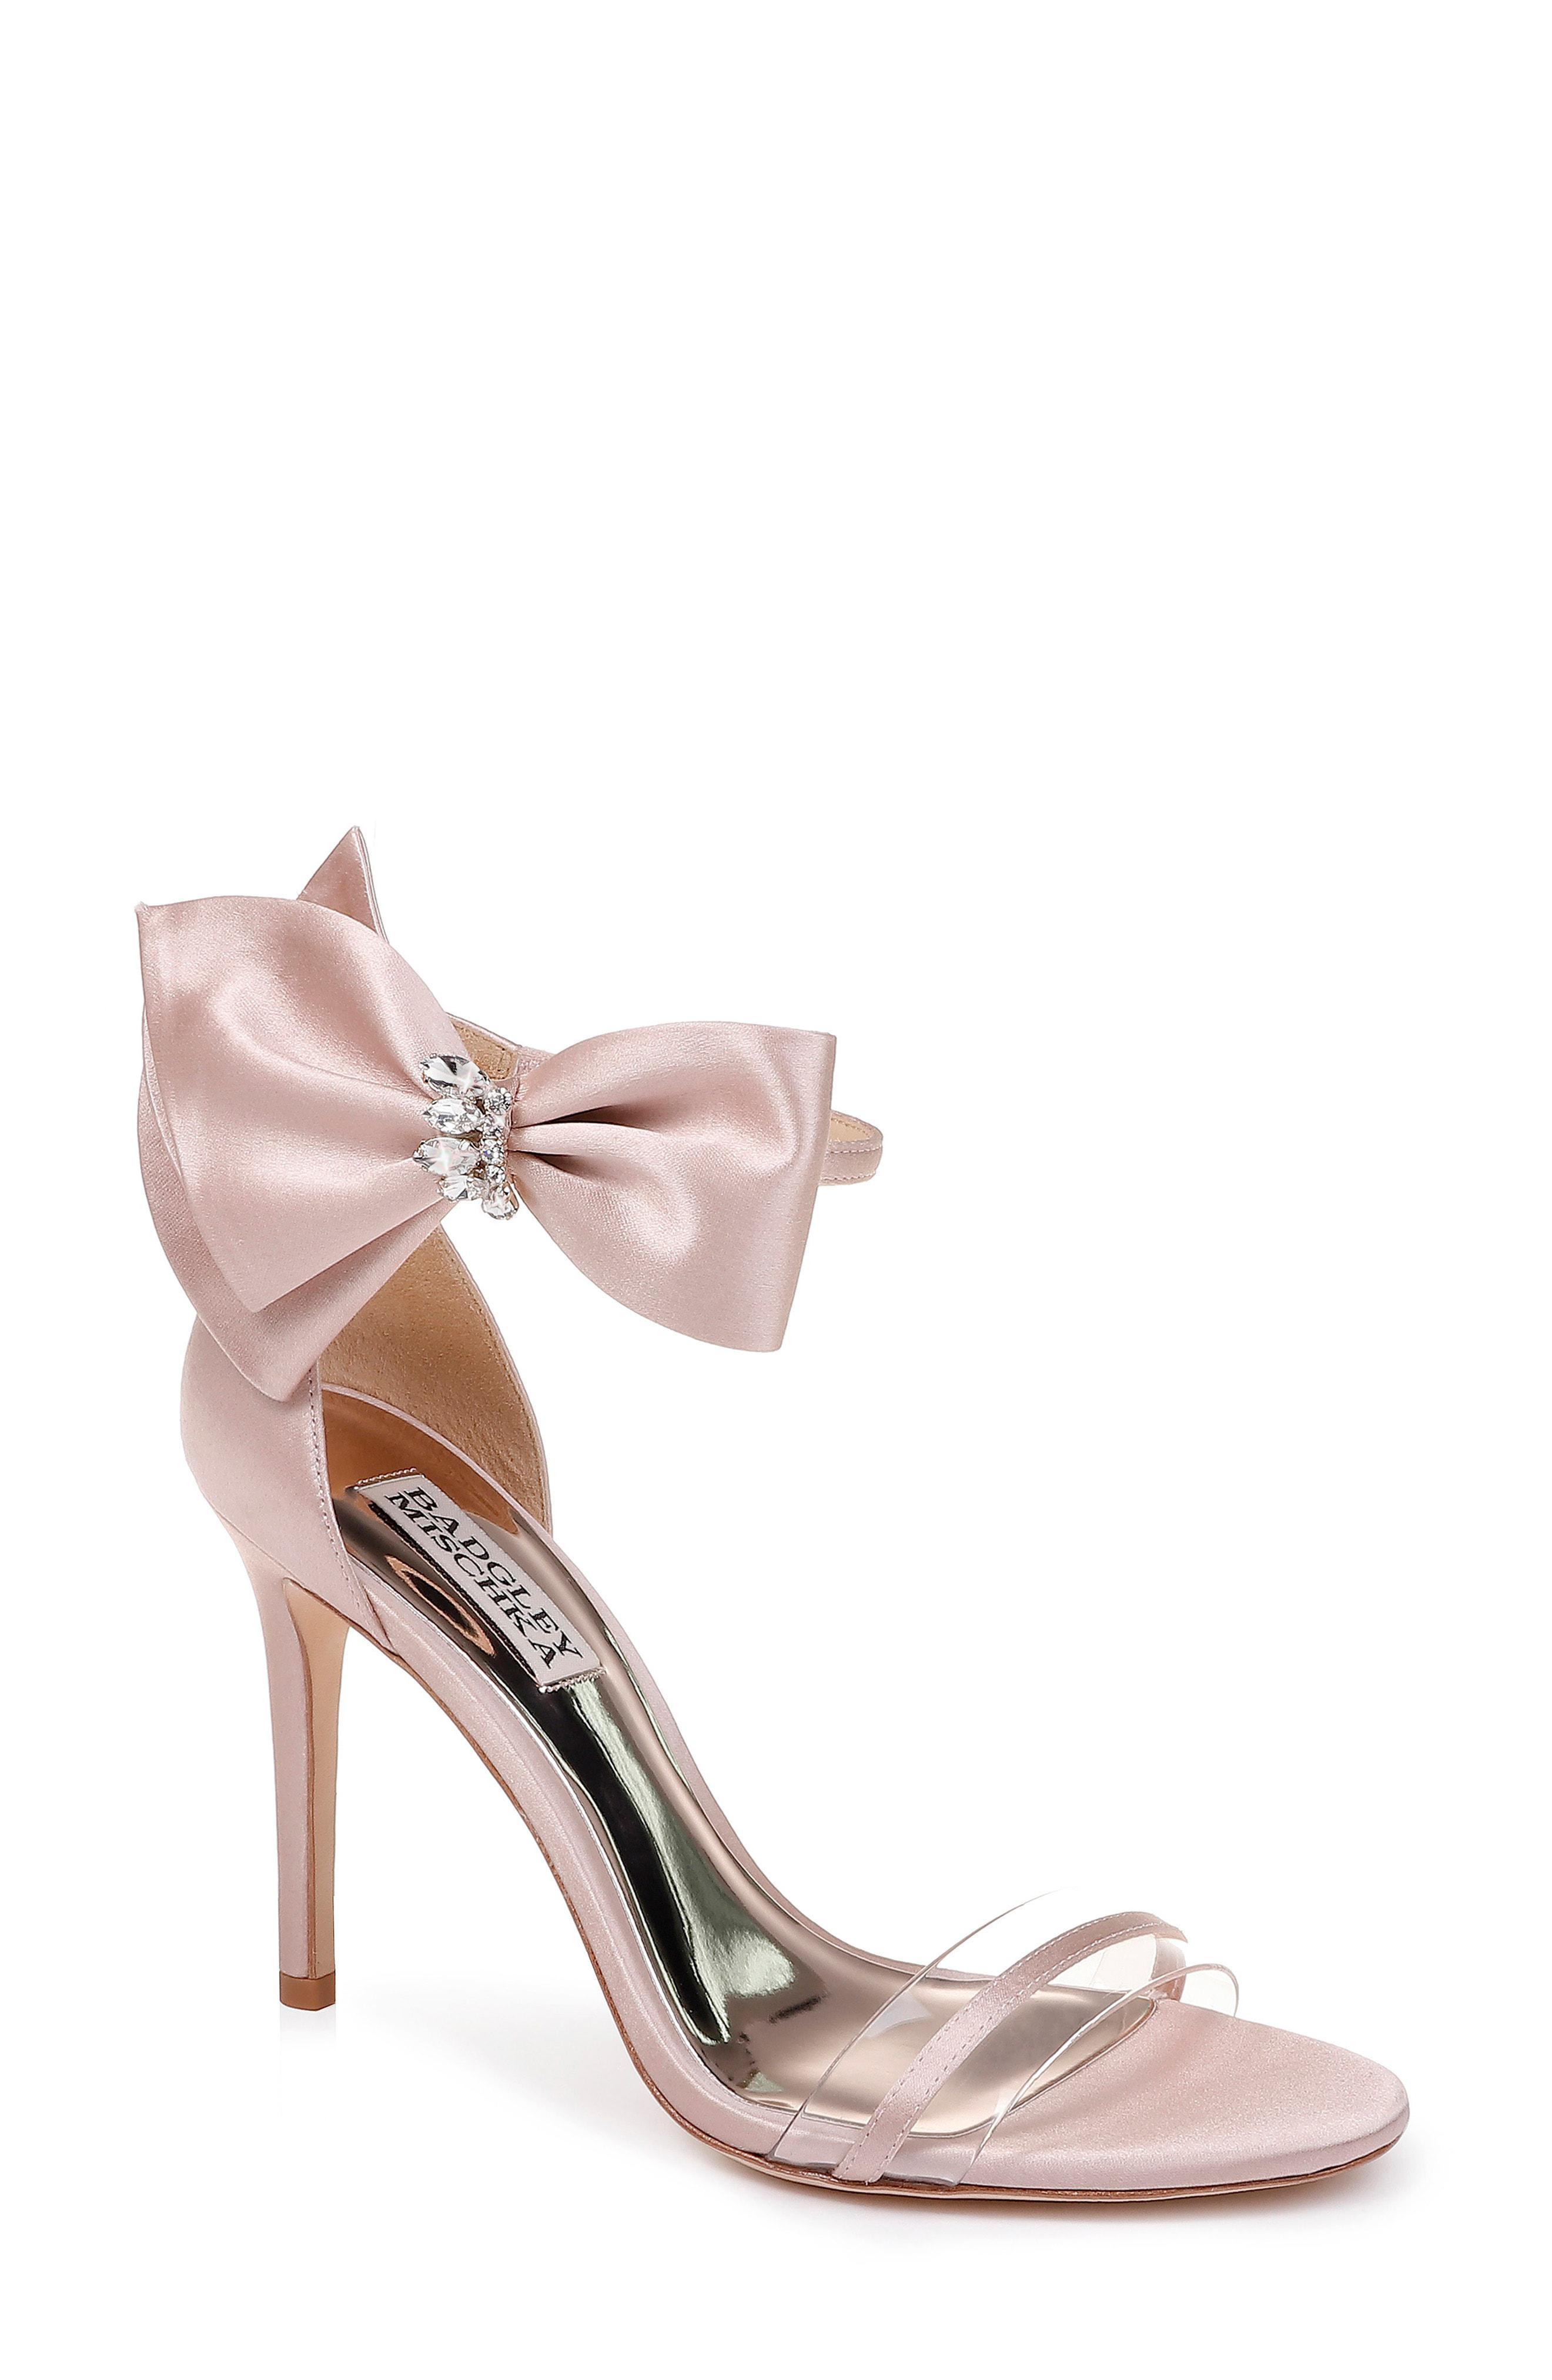 c87ae01586 Lyst - Badgley Mischka Badgley Mischka Fran Bow Ankle Strap Sandal ...